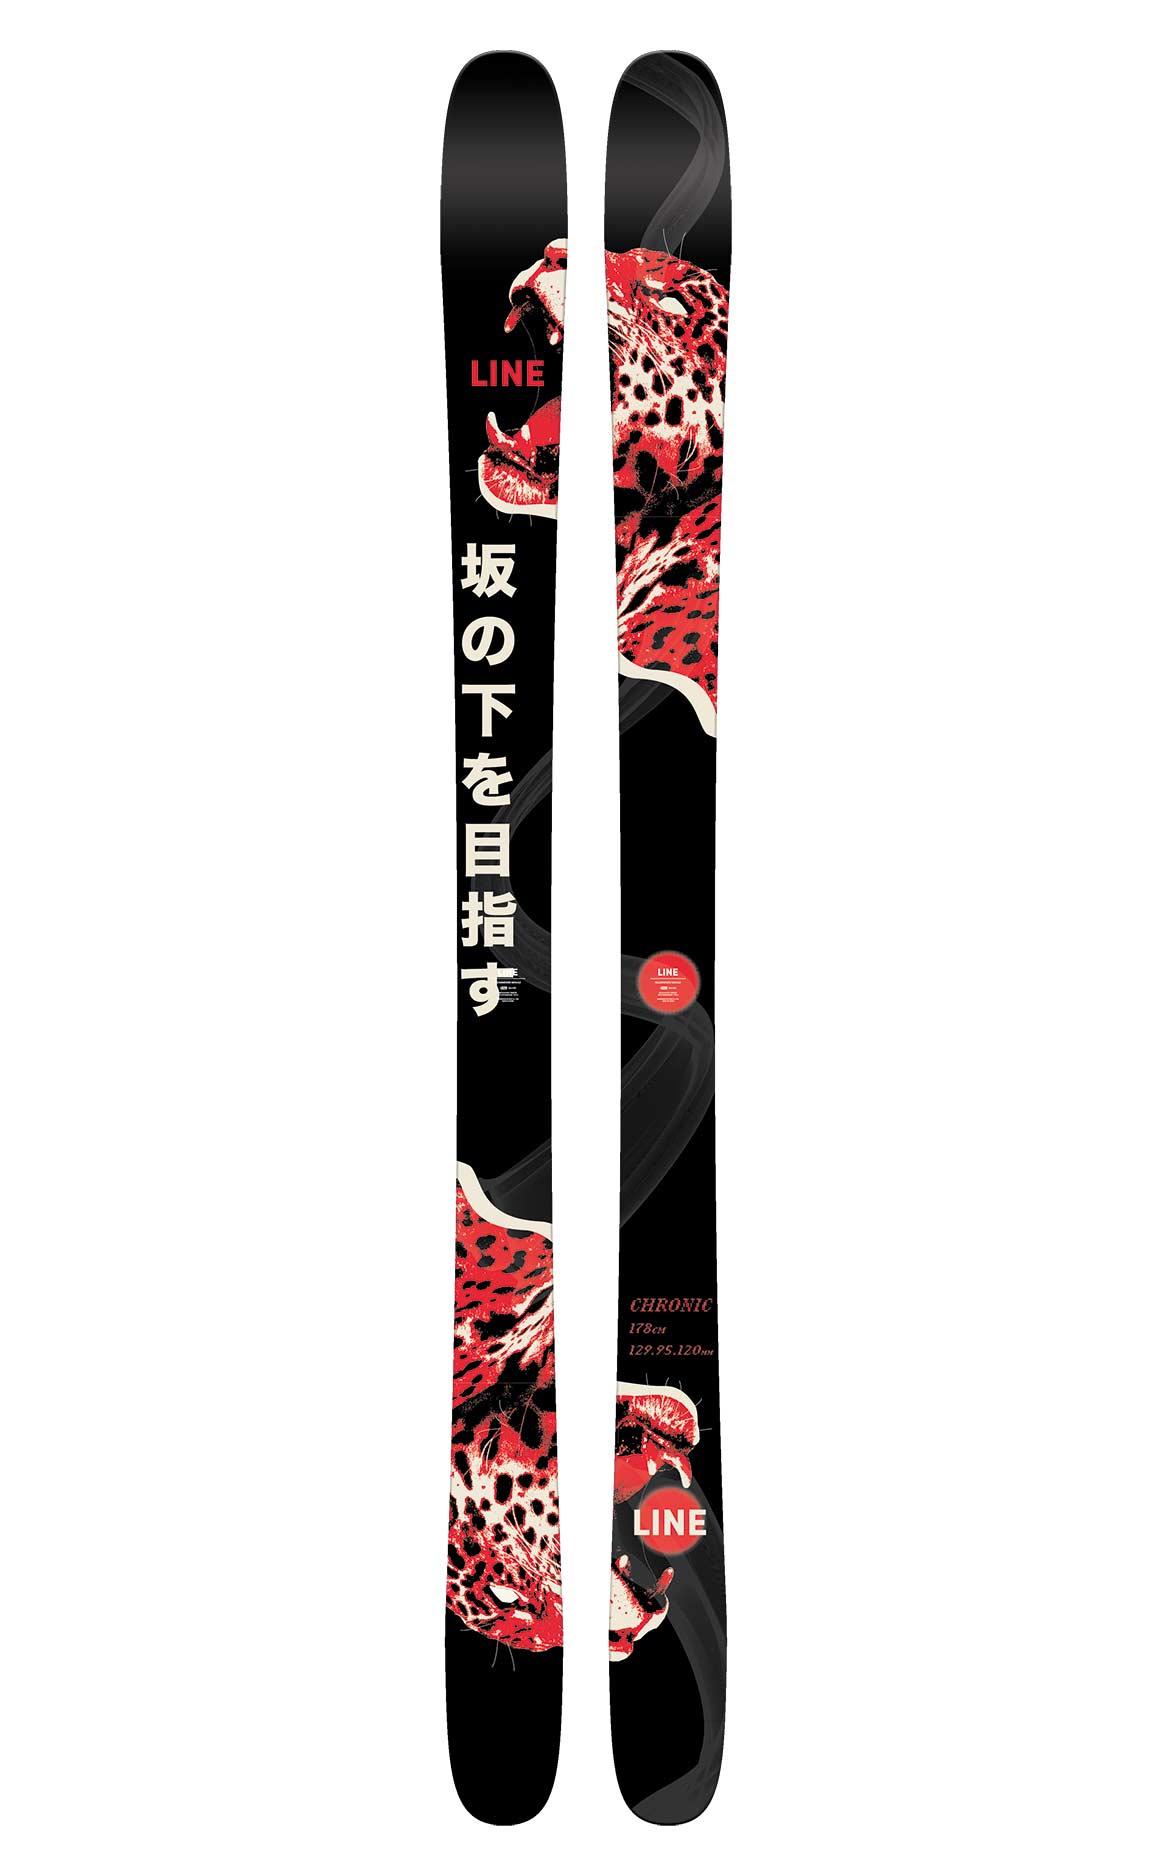 Line Skis – Chronic 2022